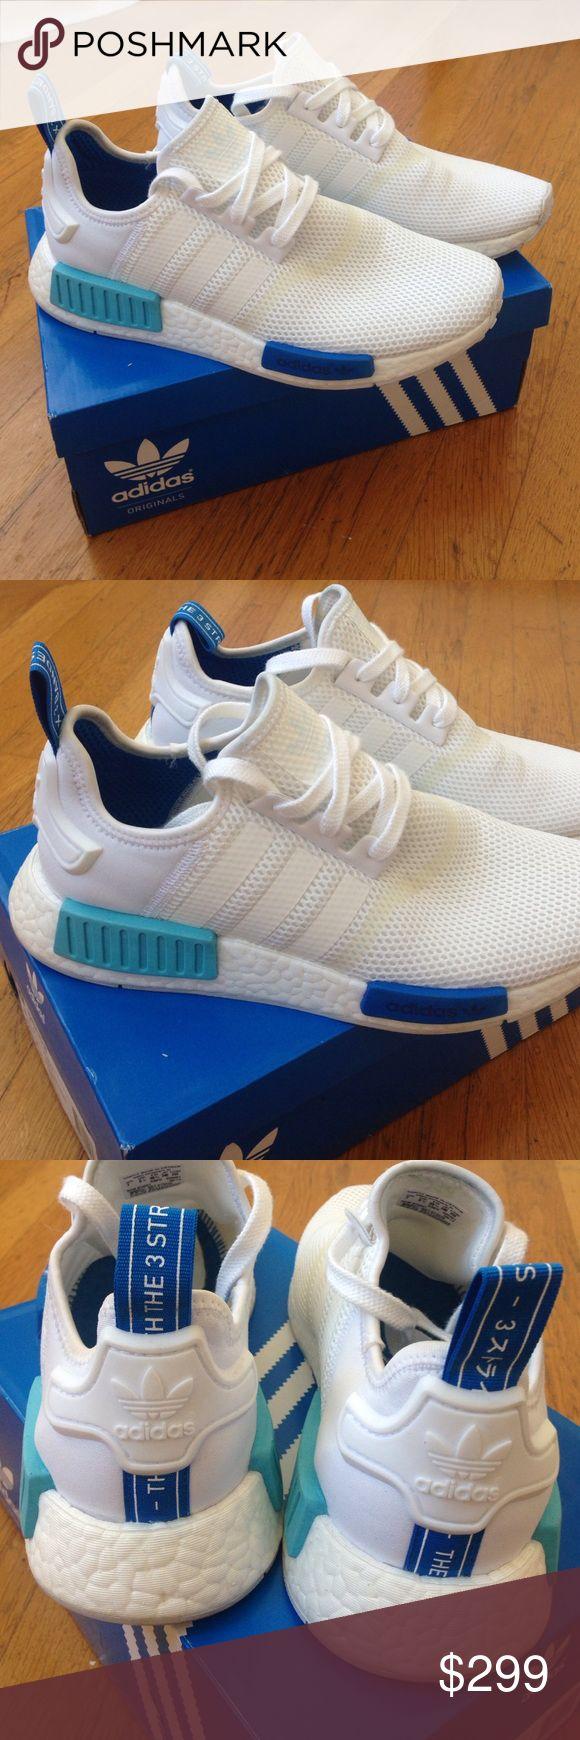 521 scarpe!le immagini su pinterest adidas scarpe, scarpe casual